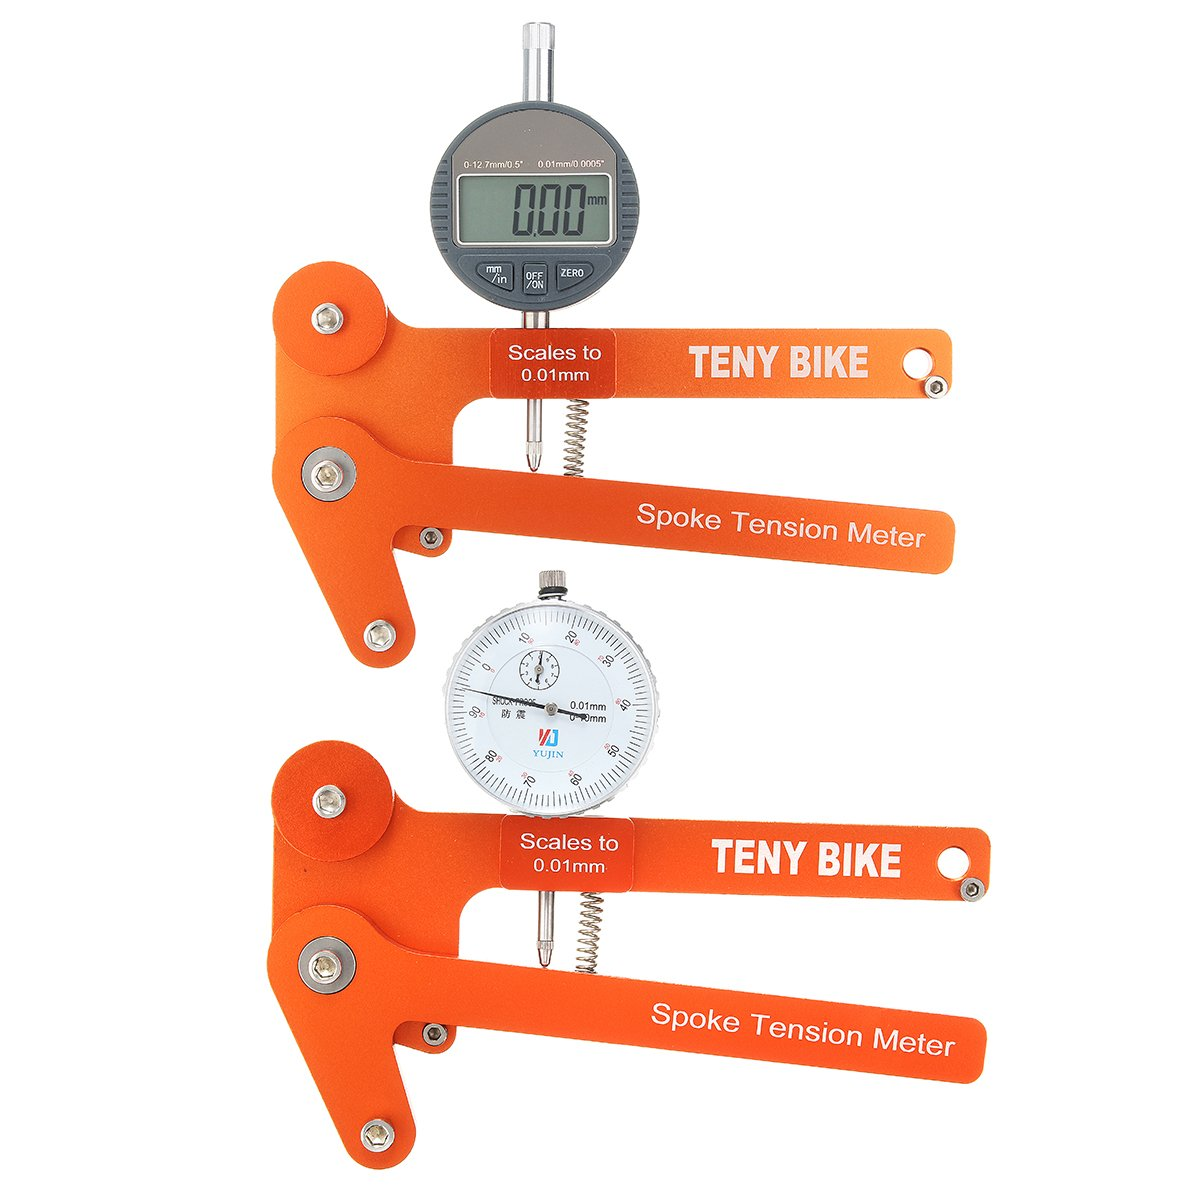 LaDicha Bikight Speiche Spannung Meter Tensiometer Fahrrad Wheel Builder Tool Digital Scale-002